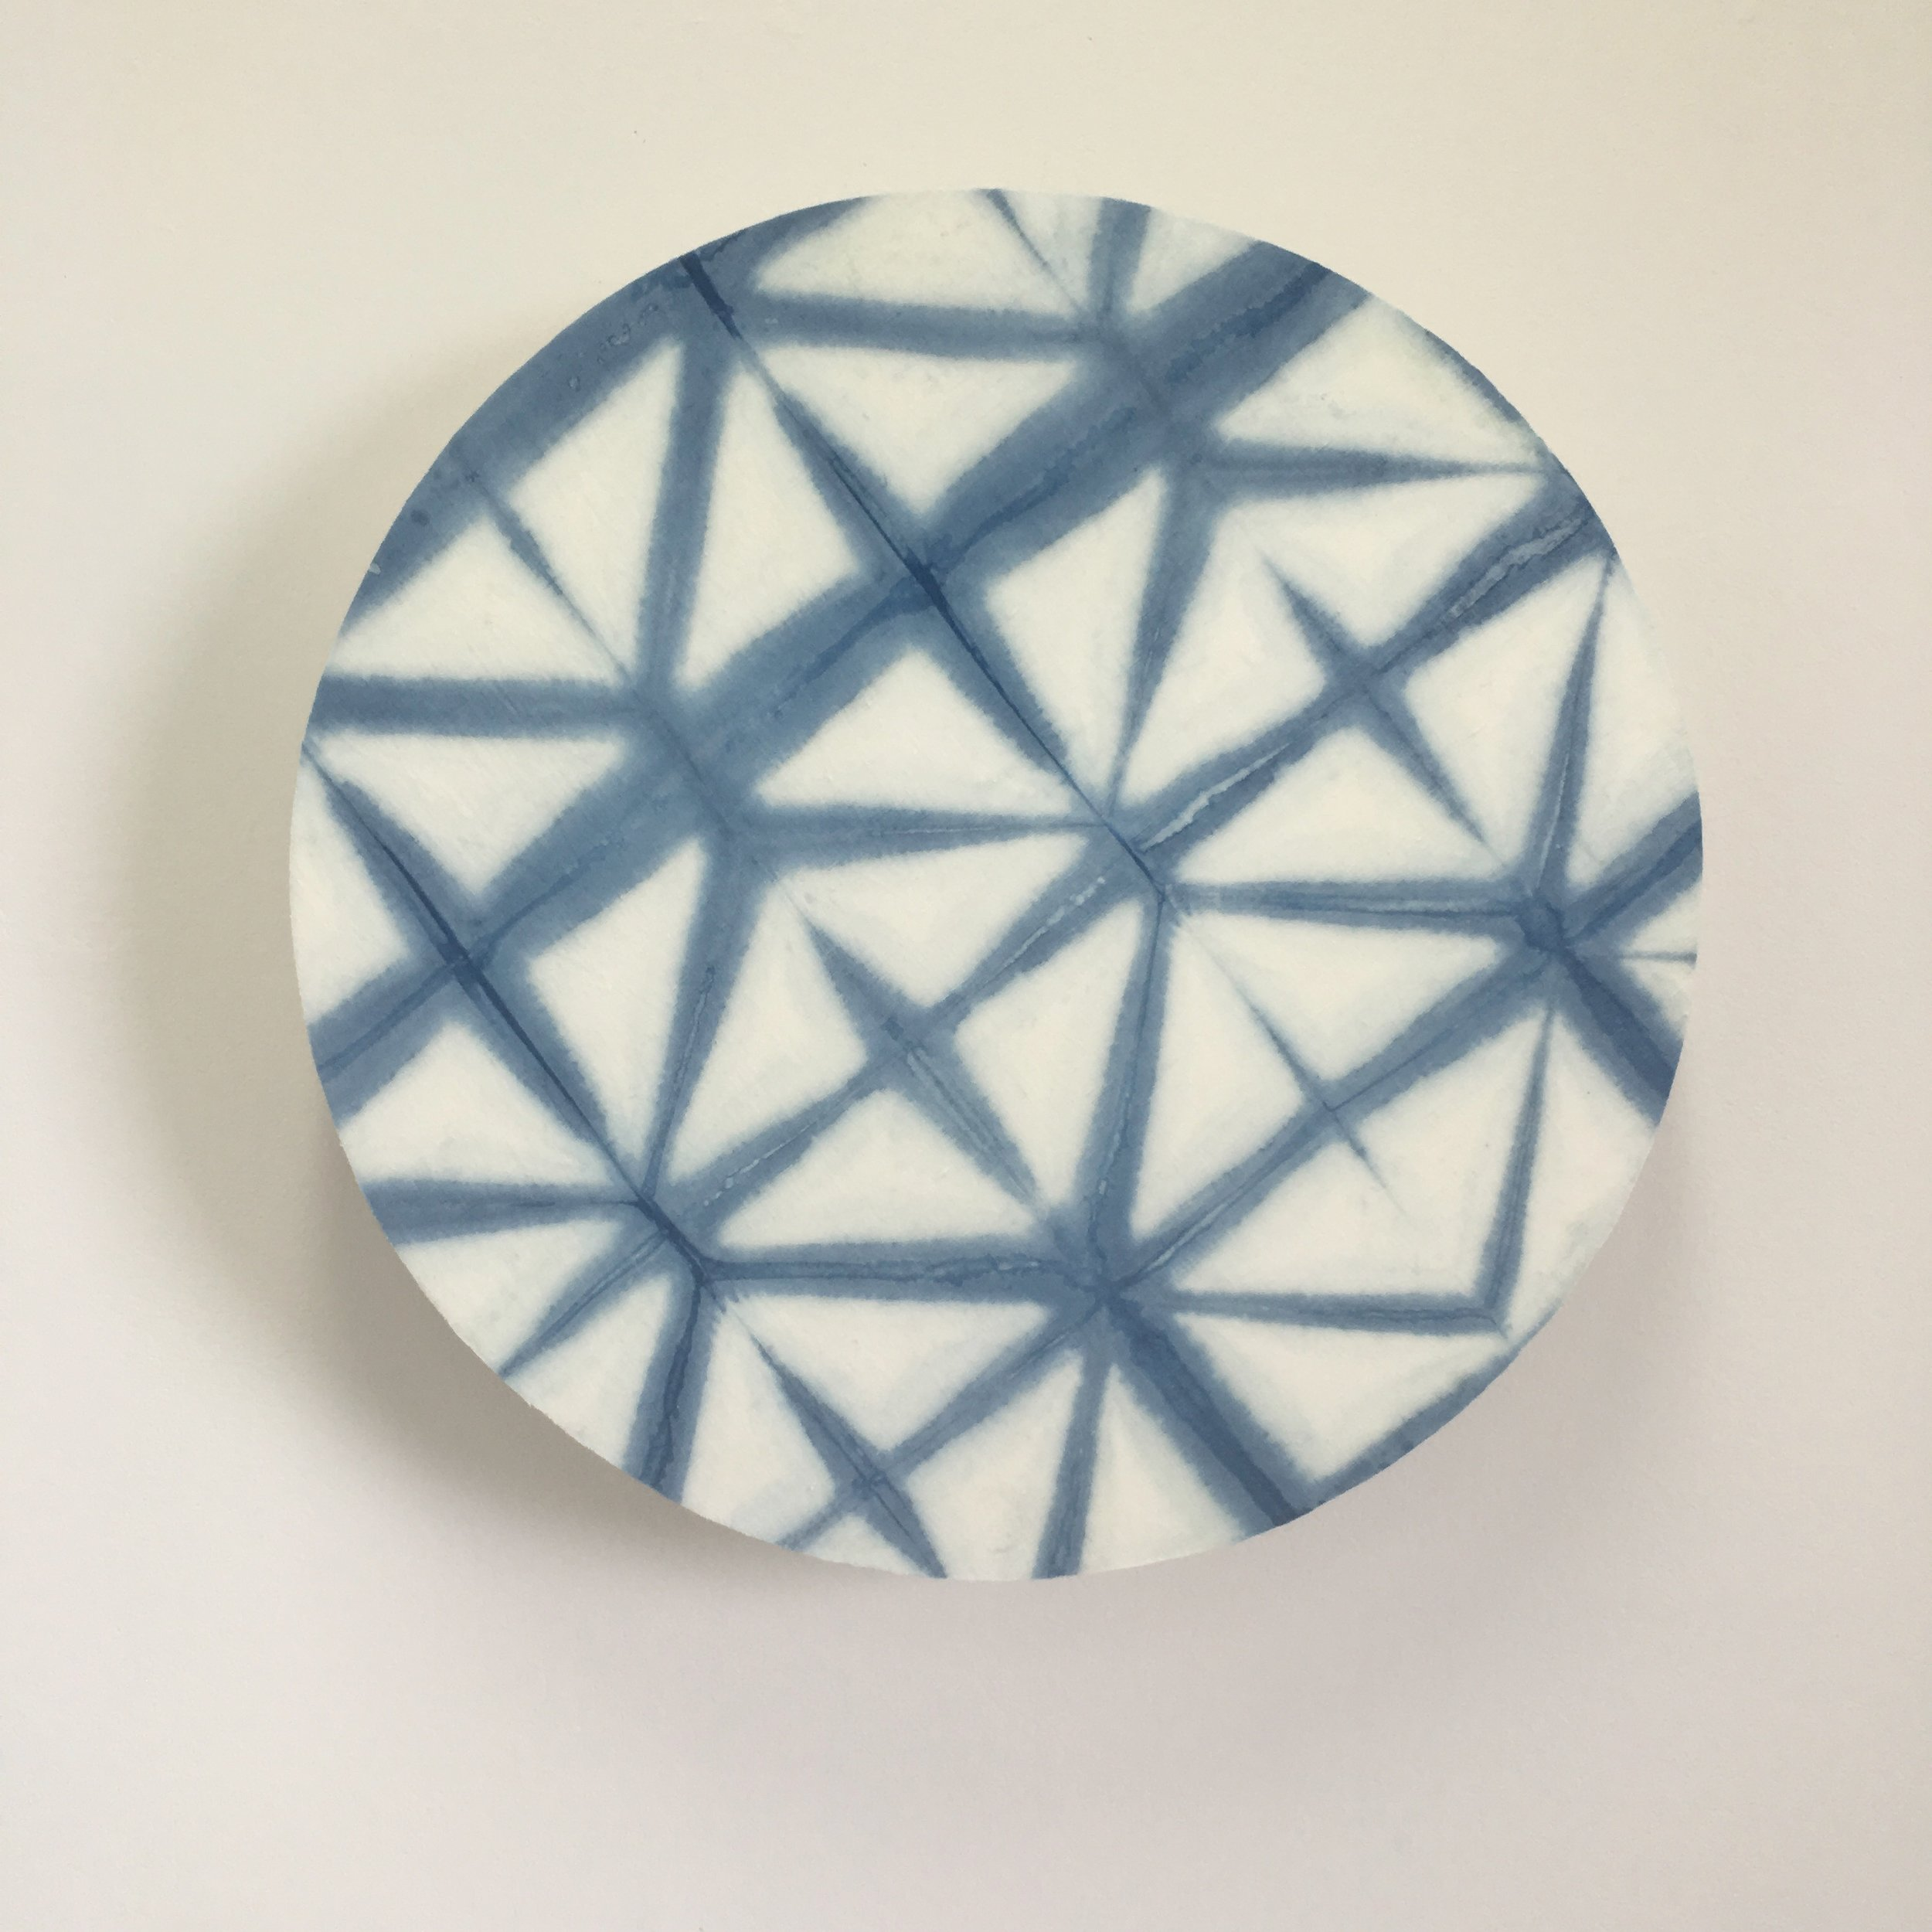 Indigo into the fold #1    Indigo dyed cotton/linen mounted on layered plywood,570 x 570 x 95